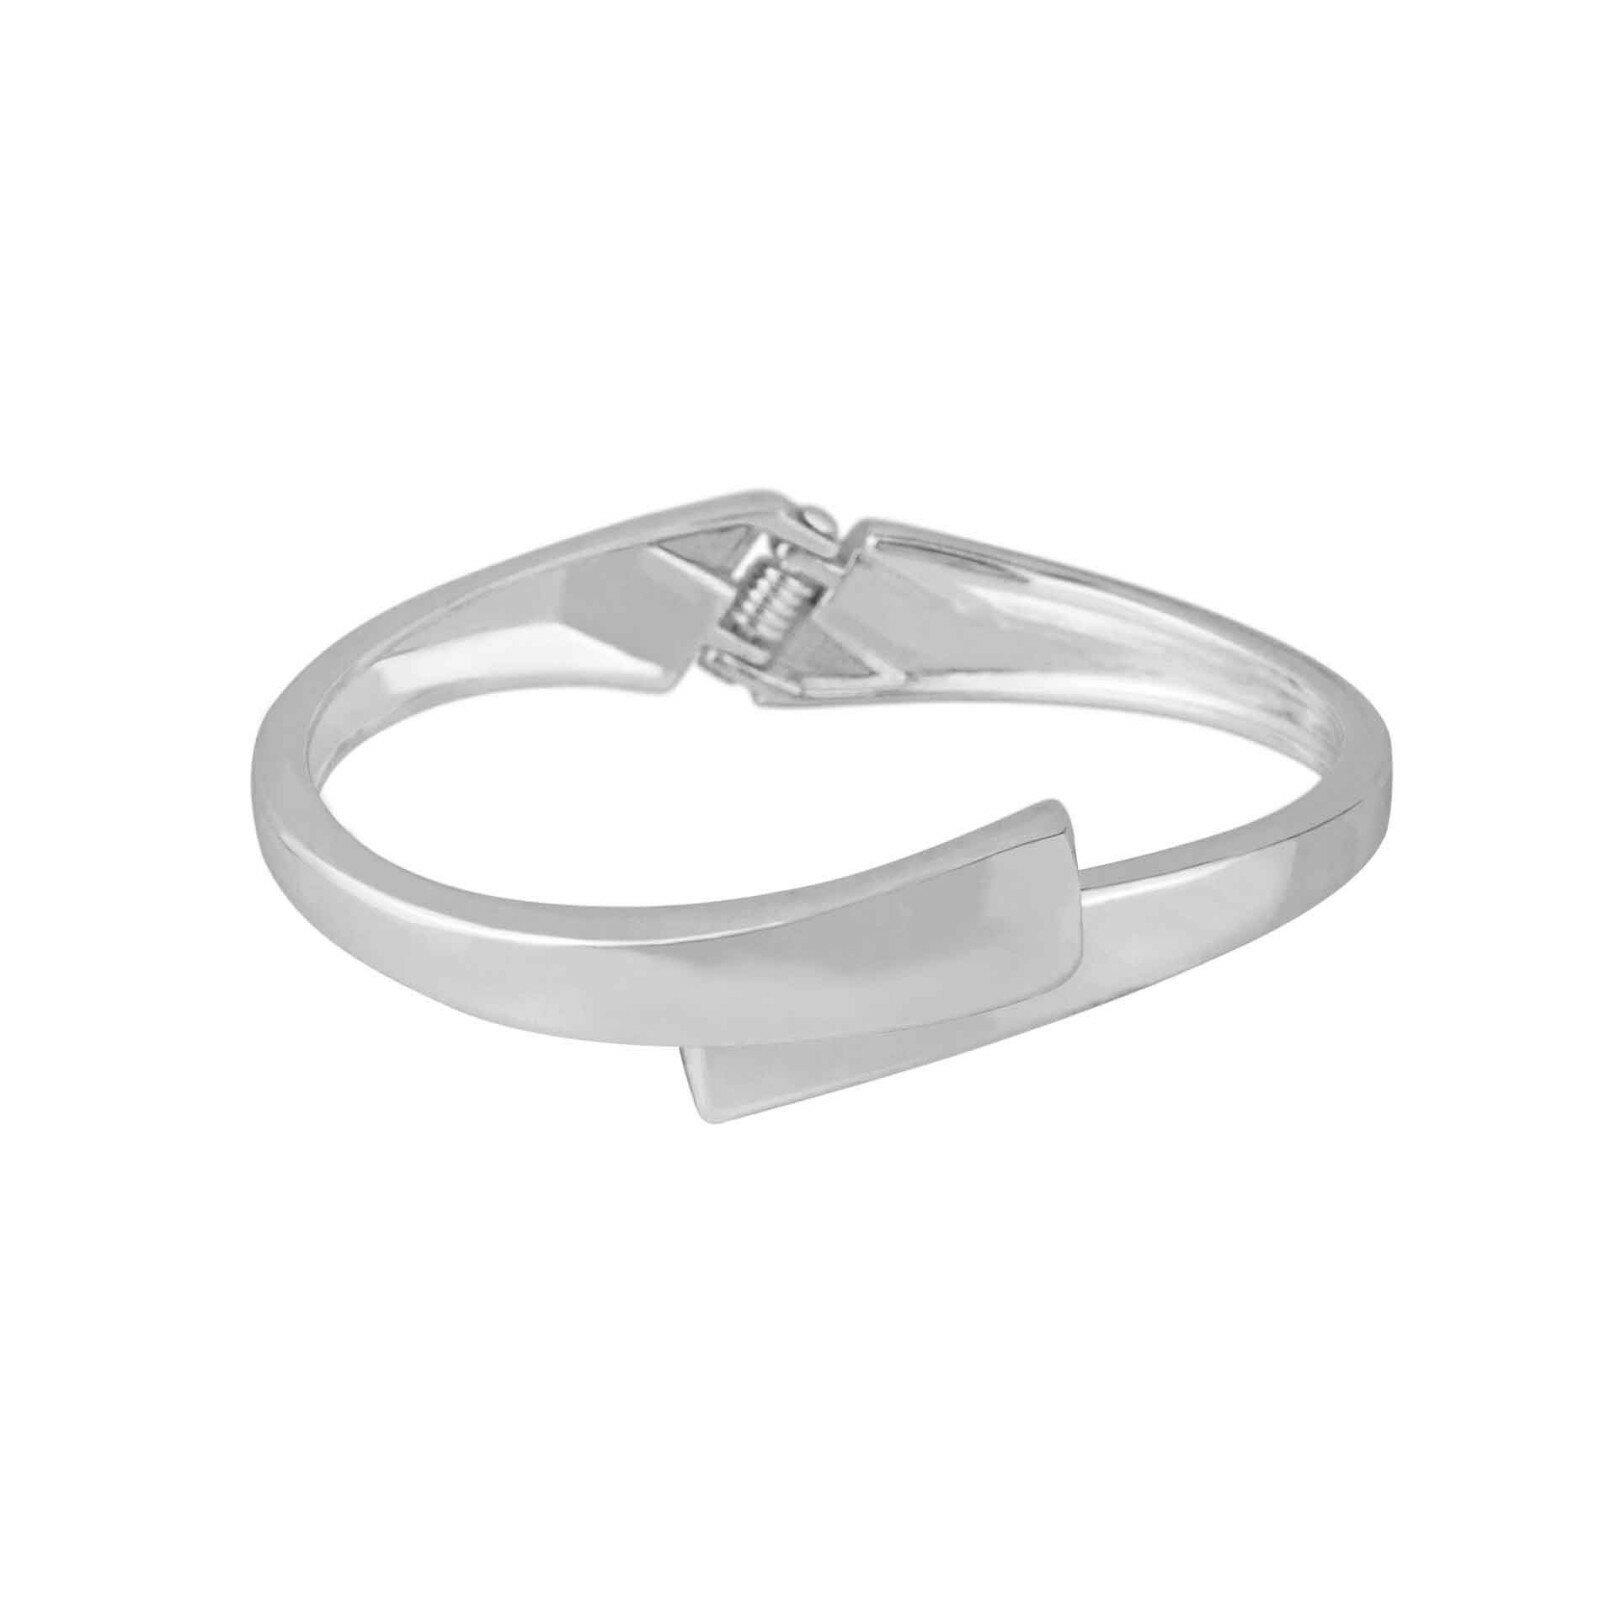 Dansk copenhagen Tara union bracelet